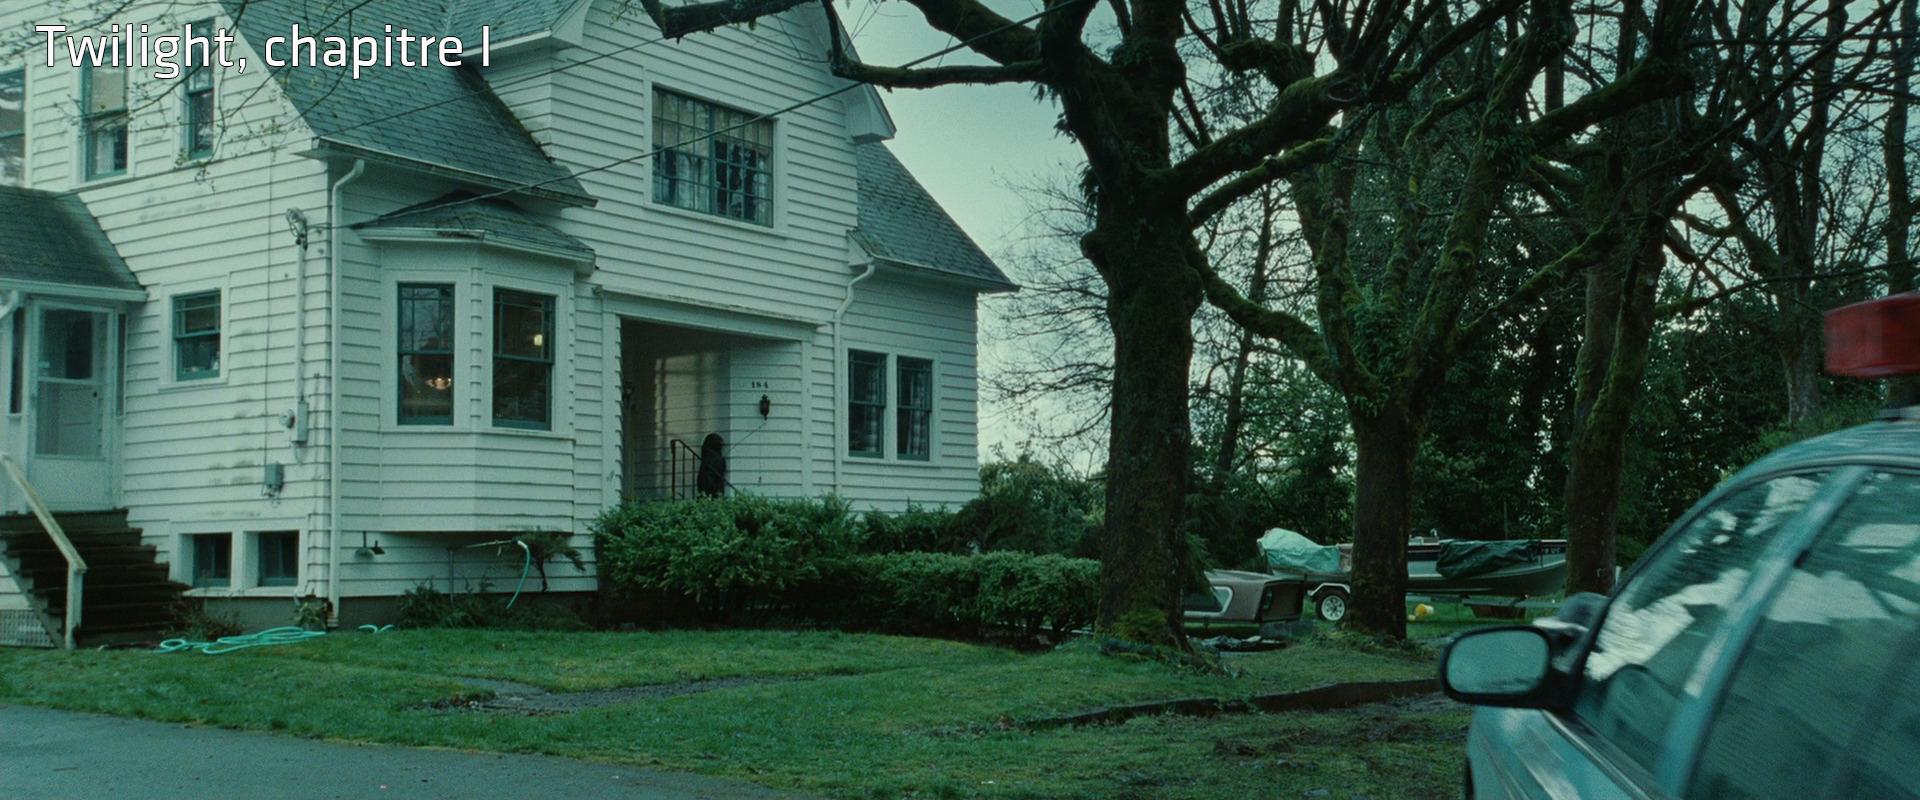 Photogrammes du film Twilight